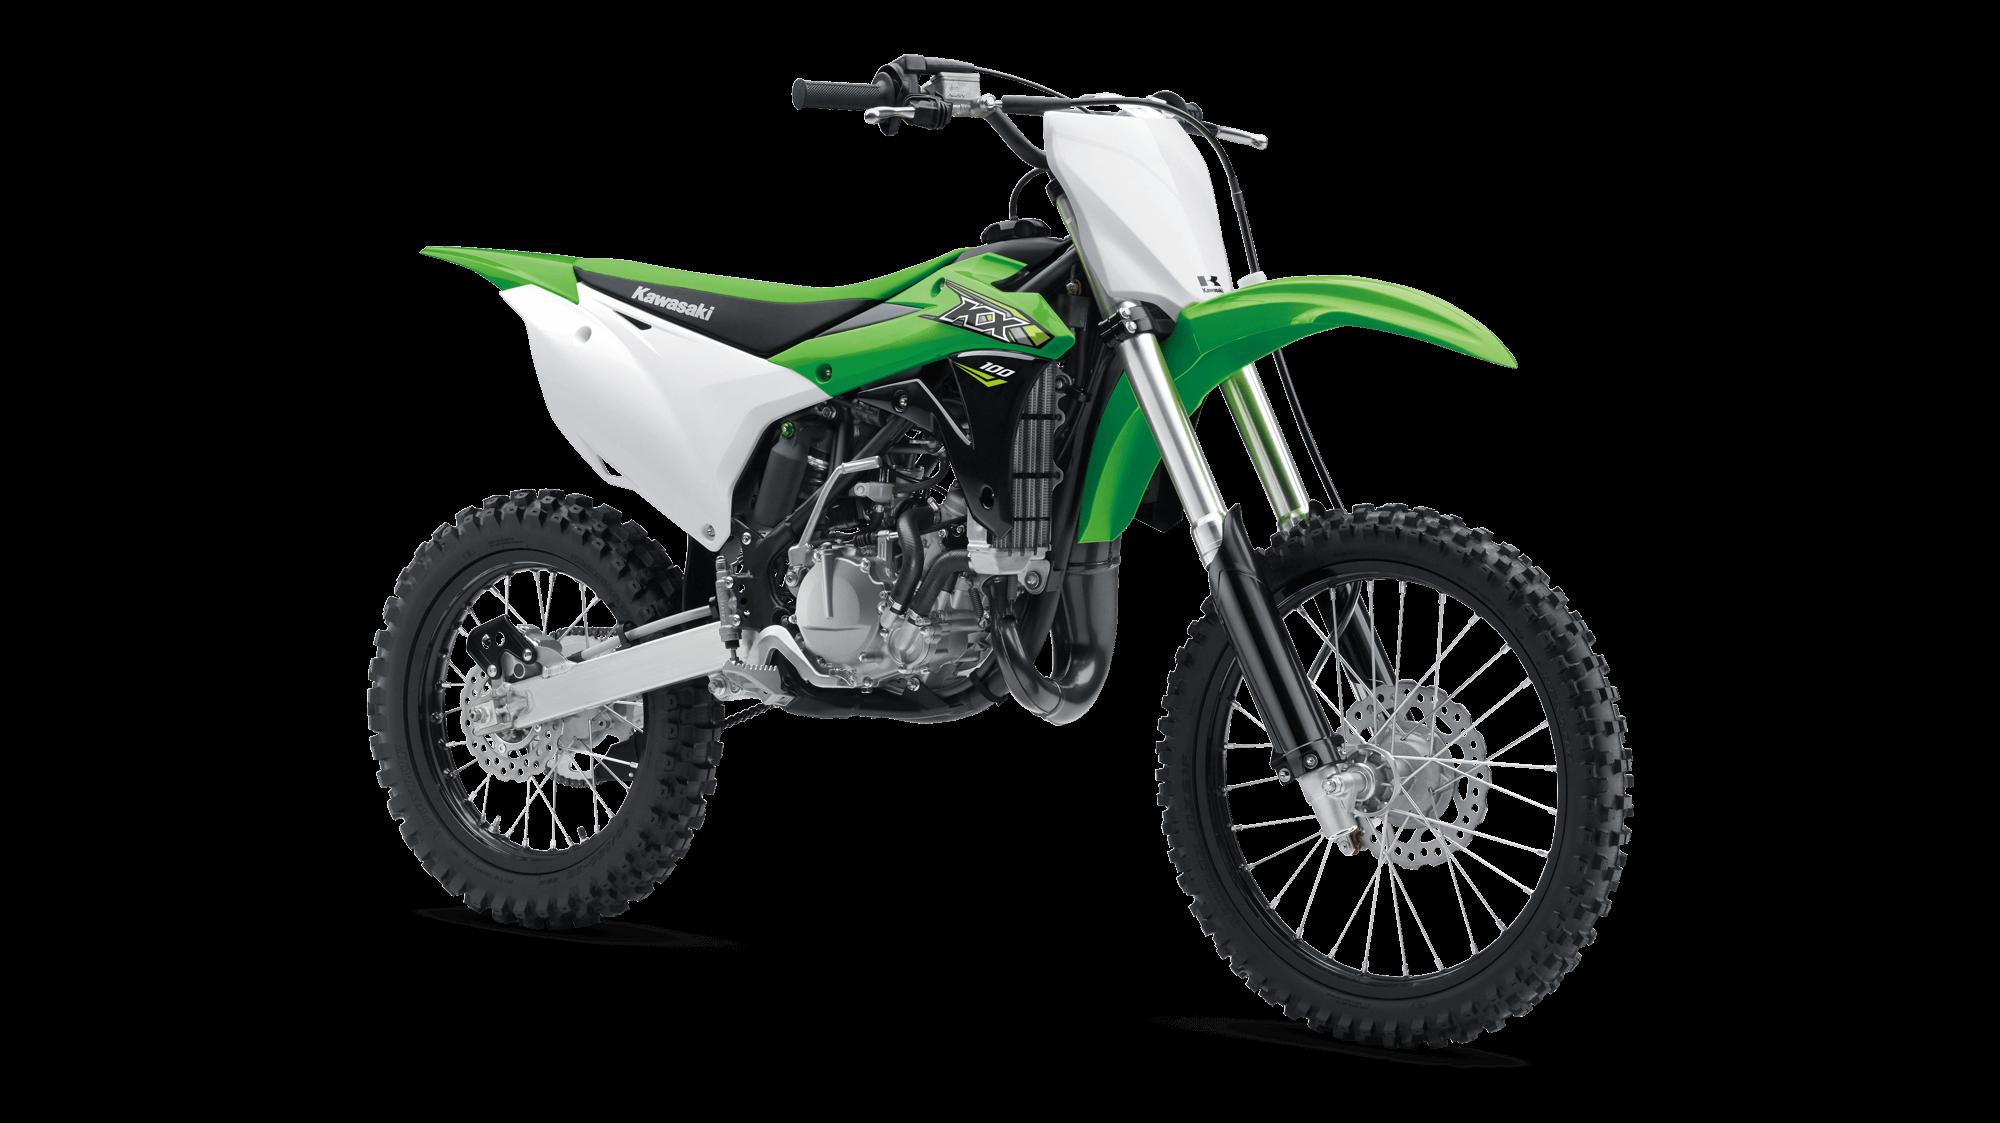 Kawasaki India Let The Good Times Roll New Honda 300cc Bikes In Kx 100